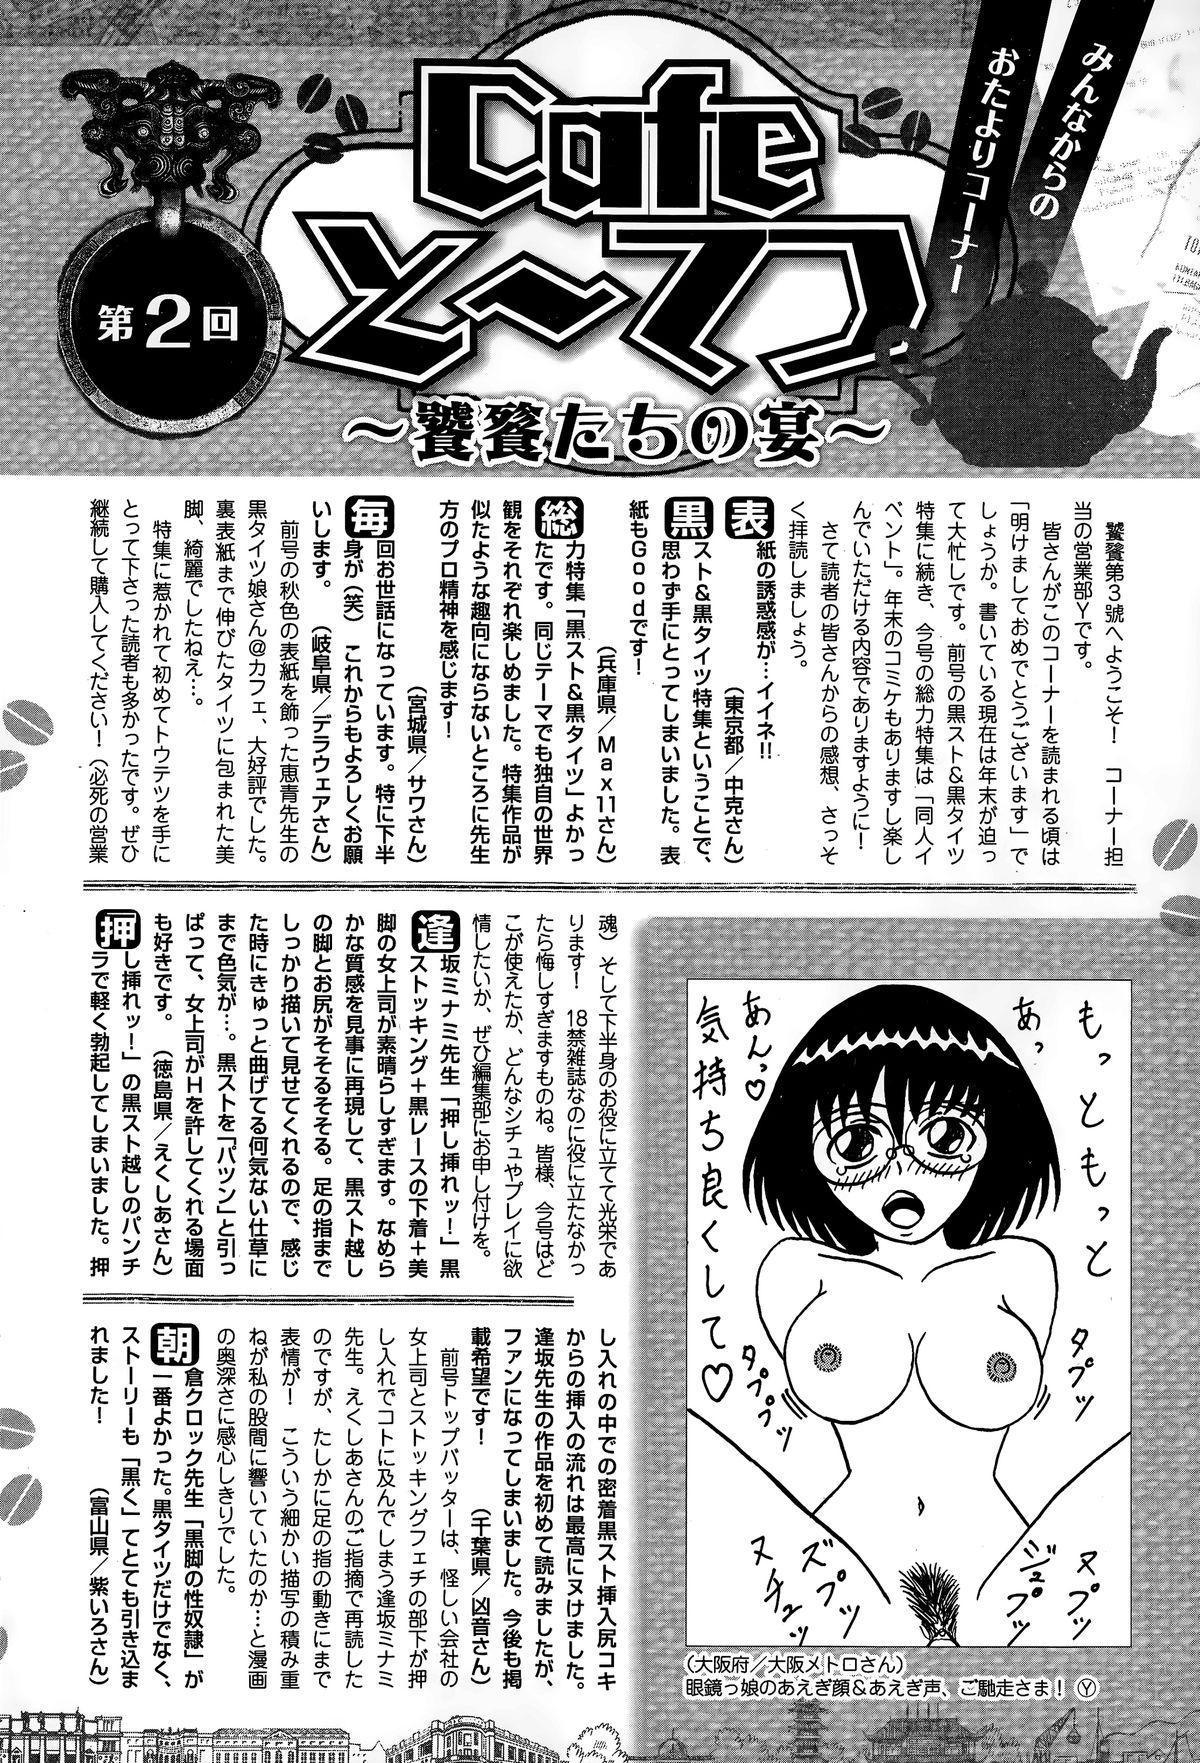 Comic Toutetsu 2015-02 Vol. 3 239